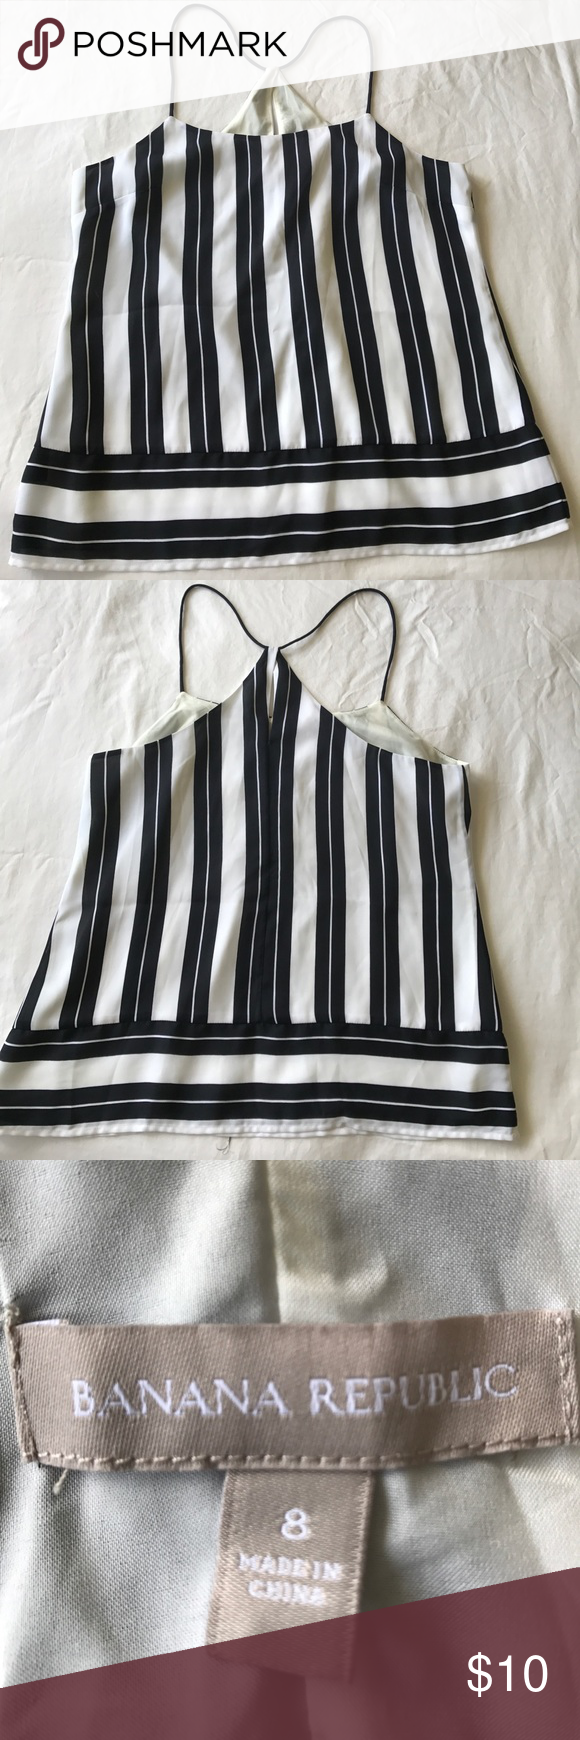 Striped banana republic lined blouse sz 8 Banana Republic blouse sz 8 stripes boxy cut Banana Republic Tops Blouses